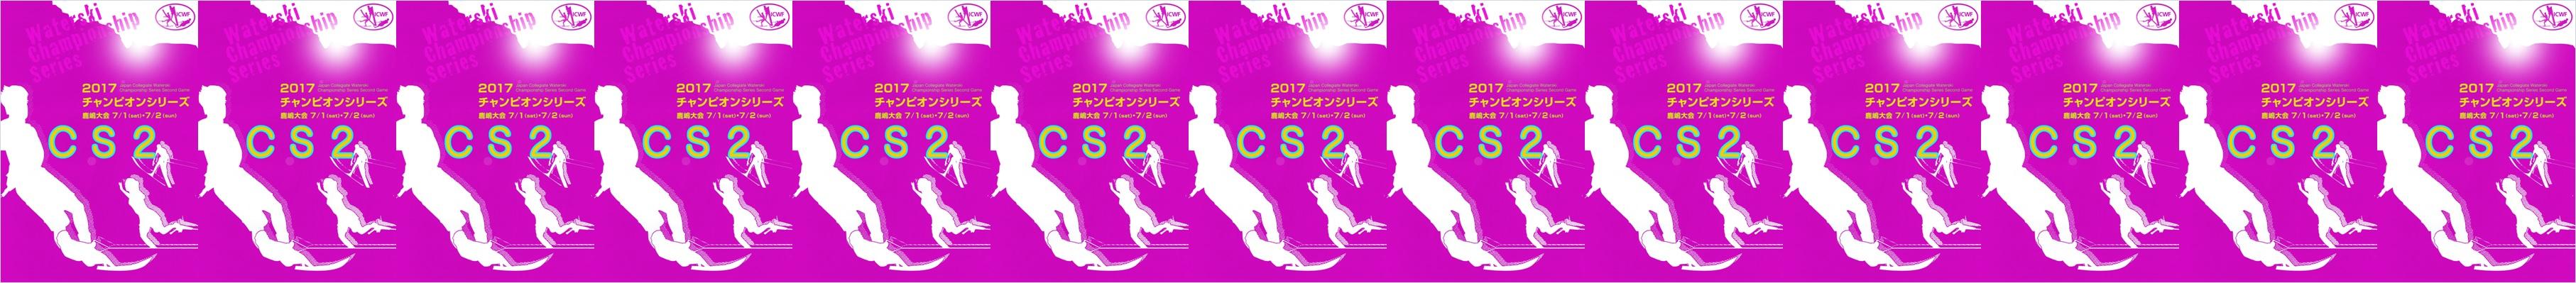 2017CS2 Women's Title_001